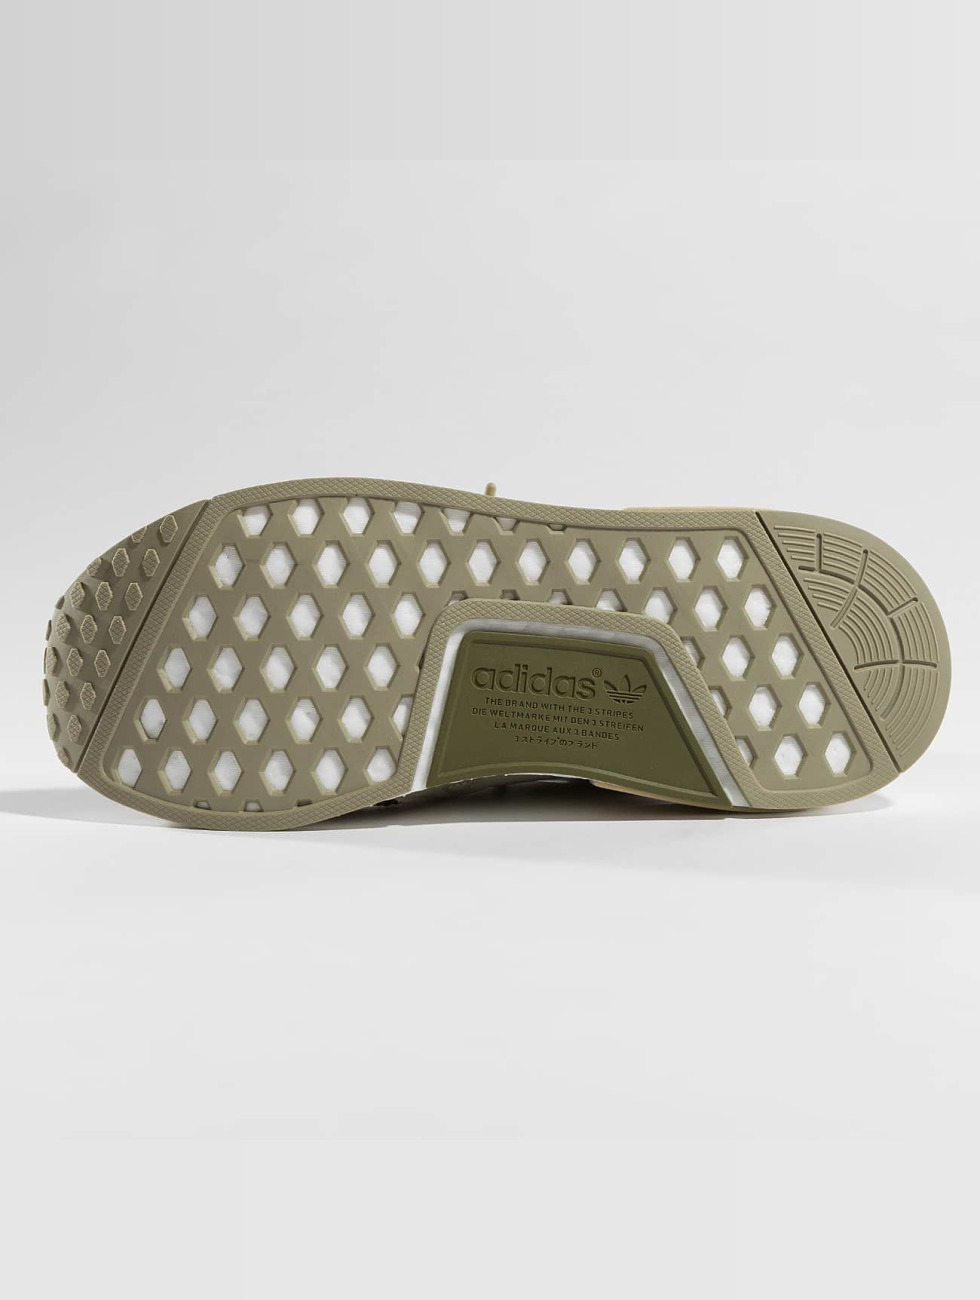 Kjøpe Billig Salg Adidas Originaler Schoen / Sneaker Nmd_xr1 Vinter I Khaki 401268 Utrolig Pris dV13es0B